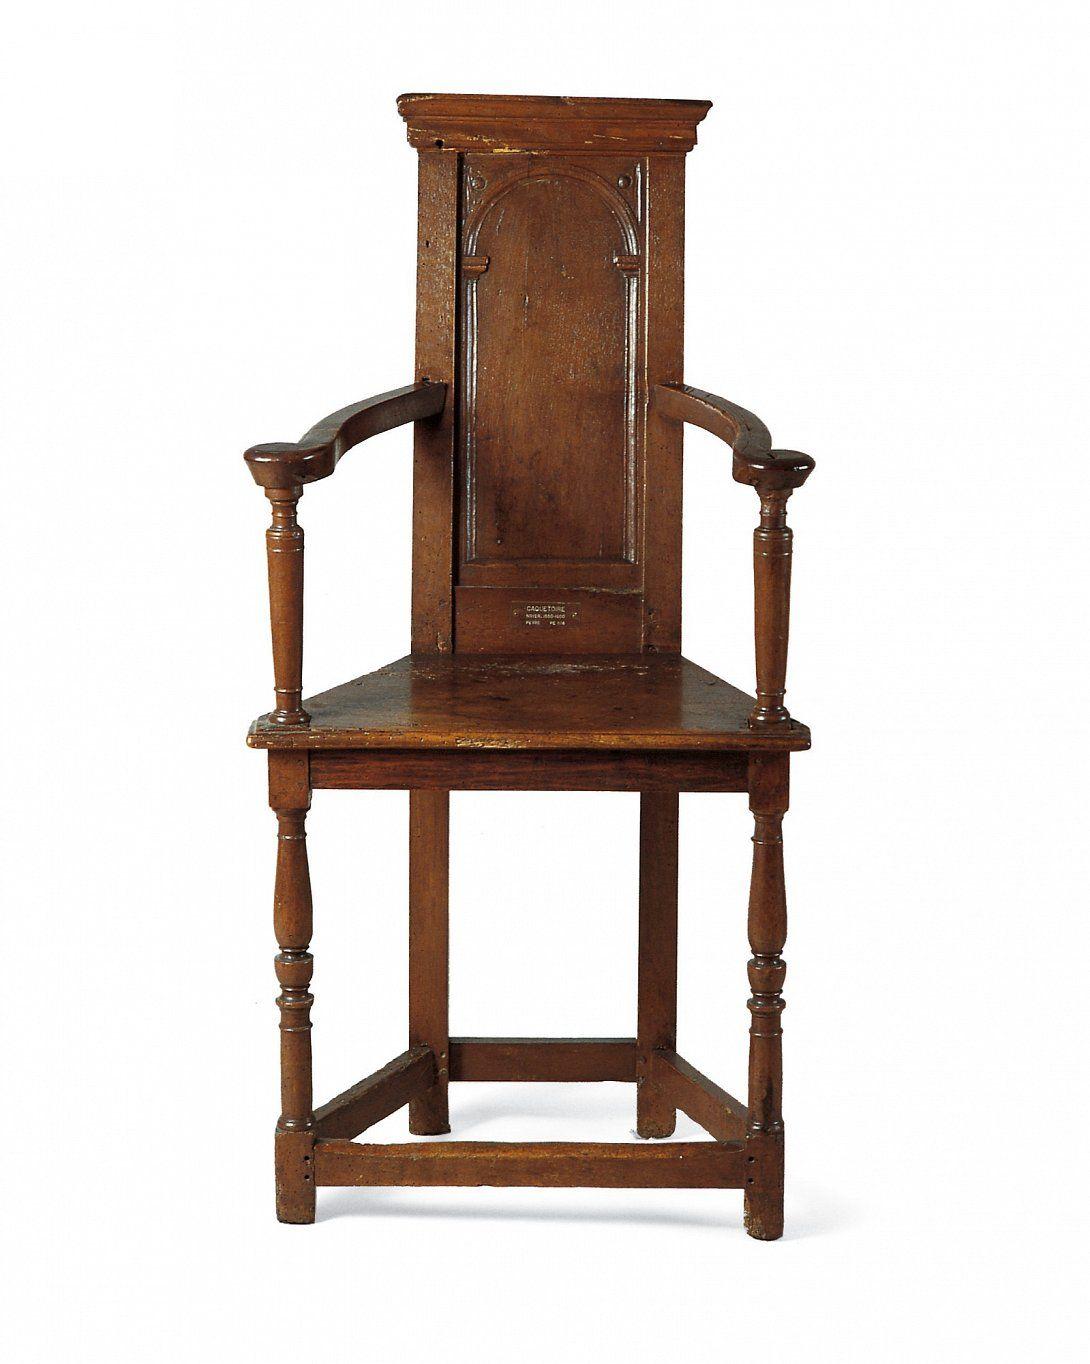 Caquetoire Renaissance Furniture Baroque Furniture Chair